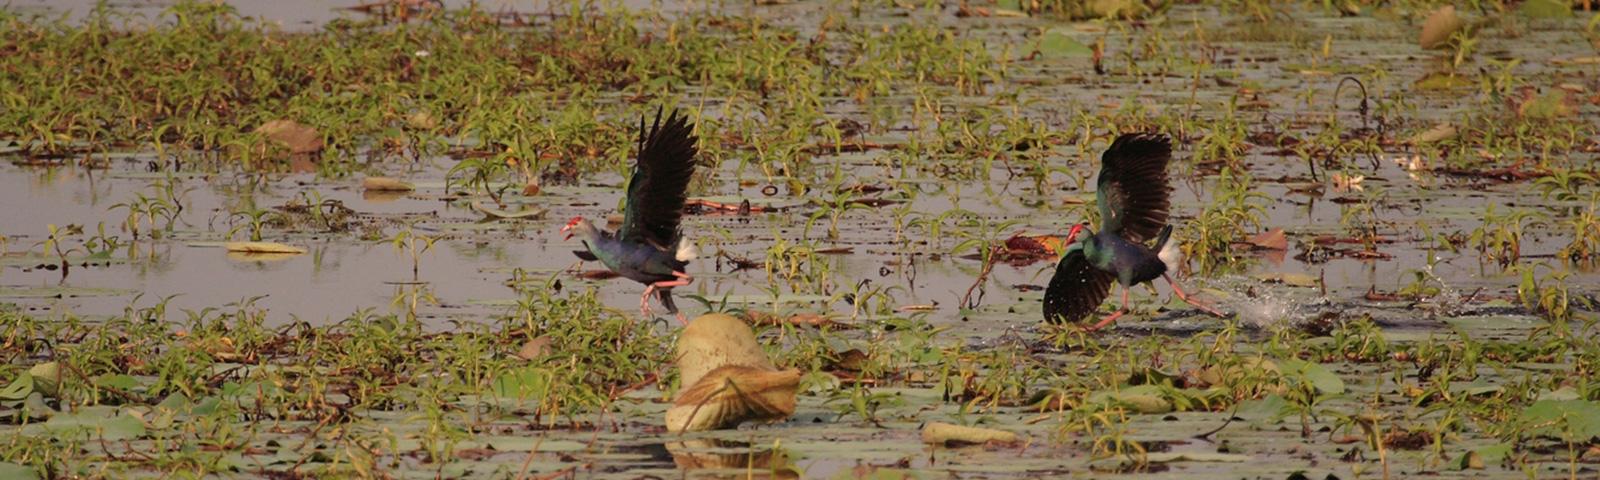 Bird Watching in Sri Lanka